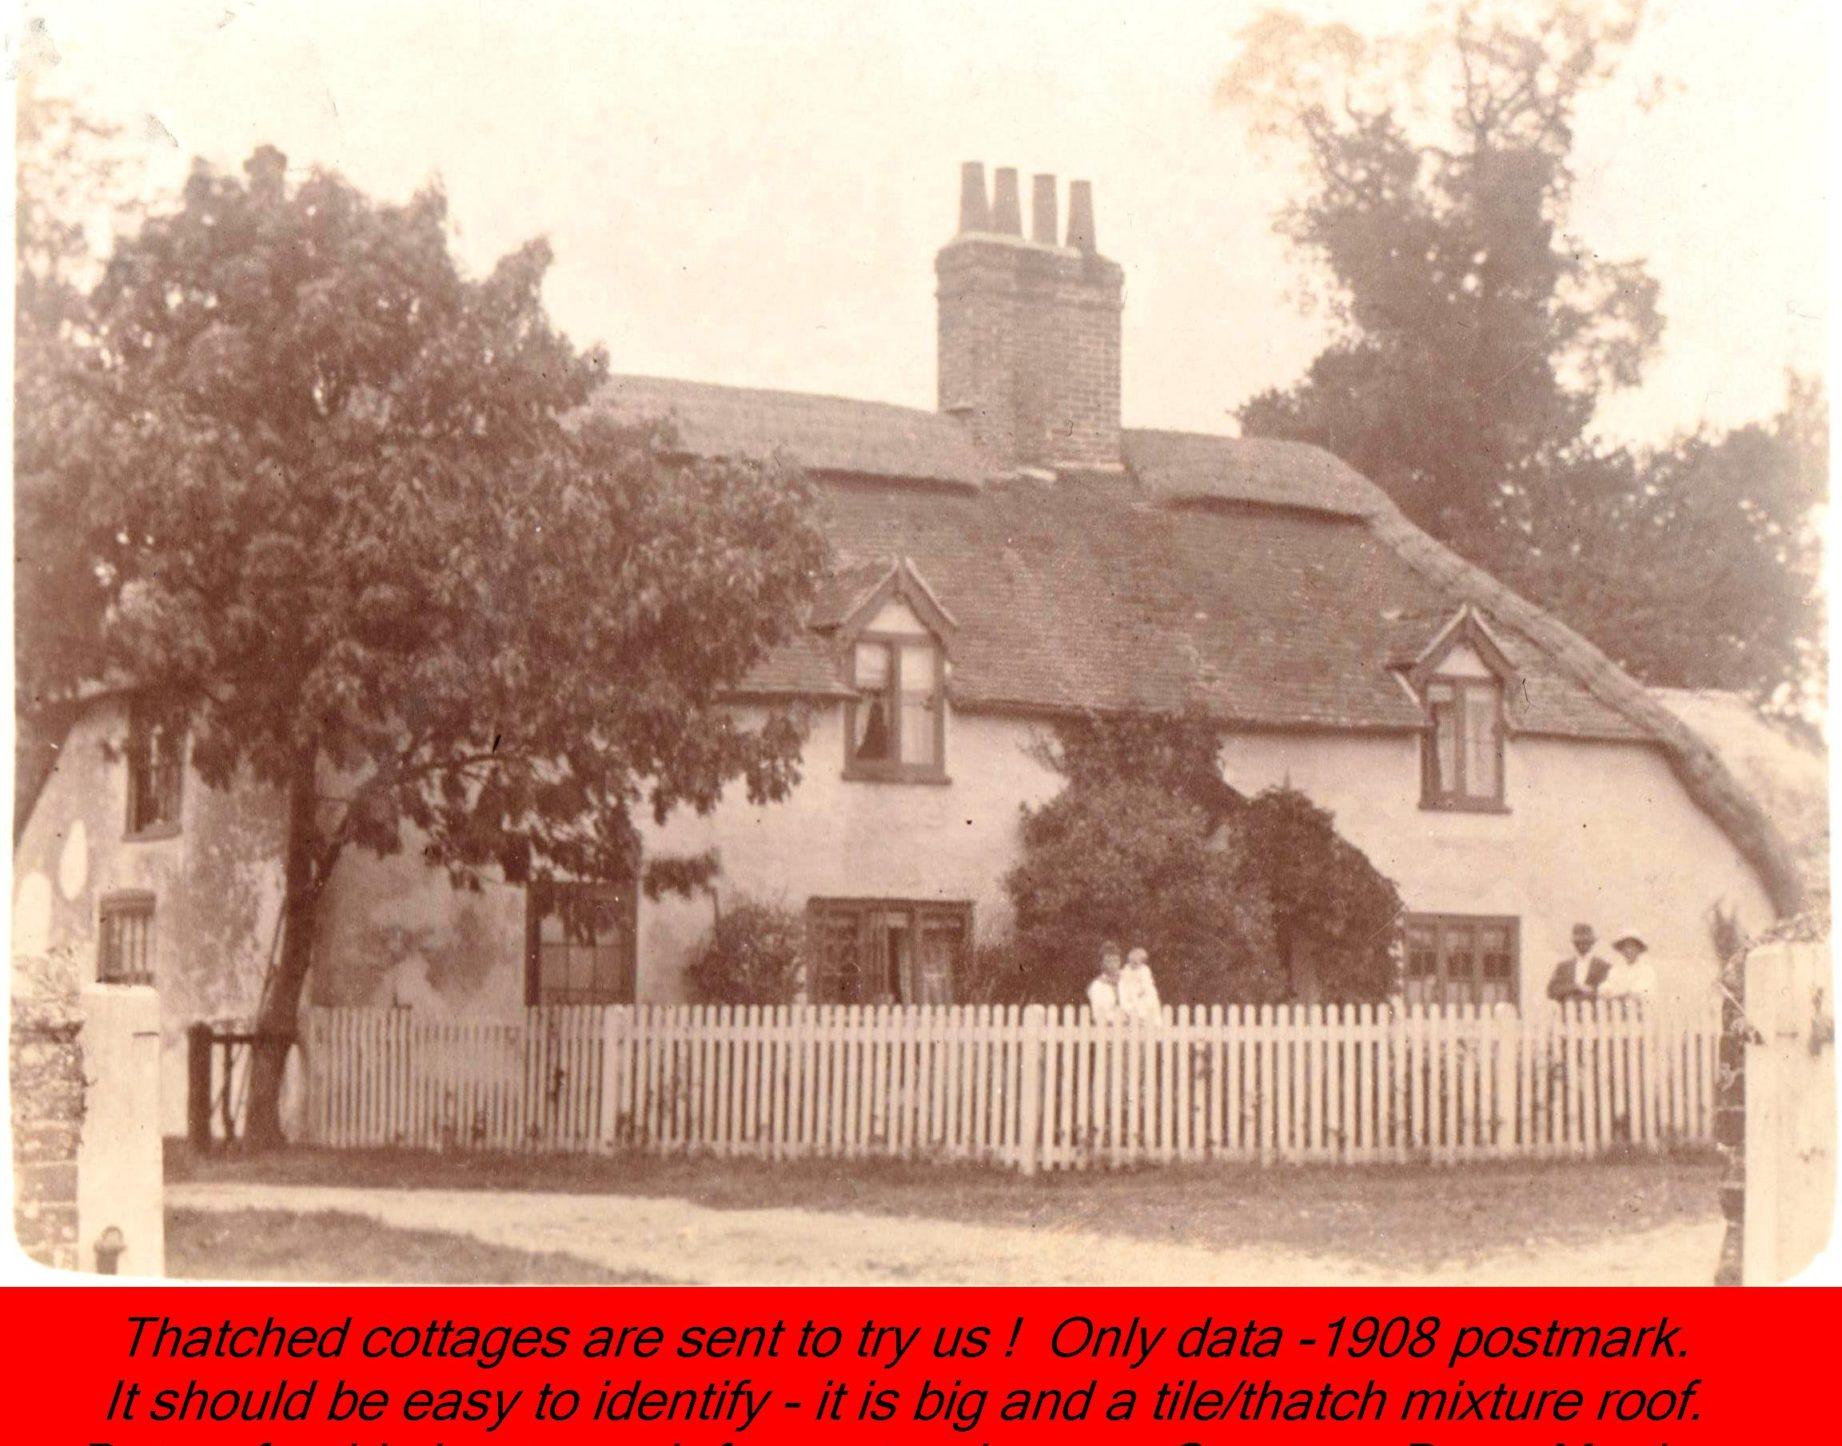 rw2 - postmarked Westbourne 1908